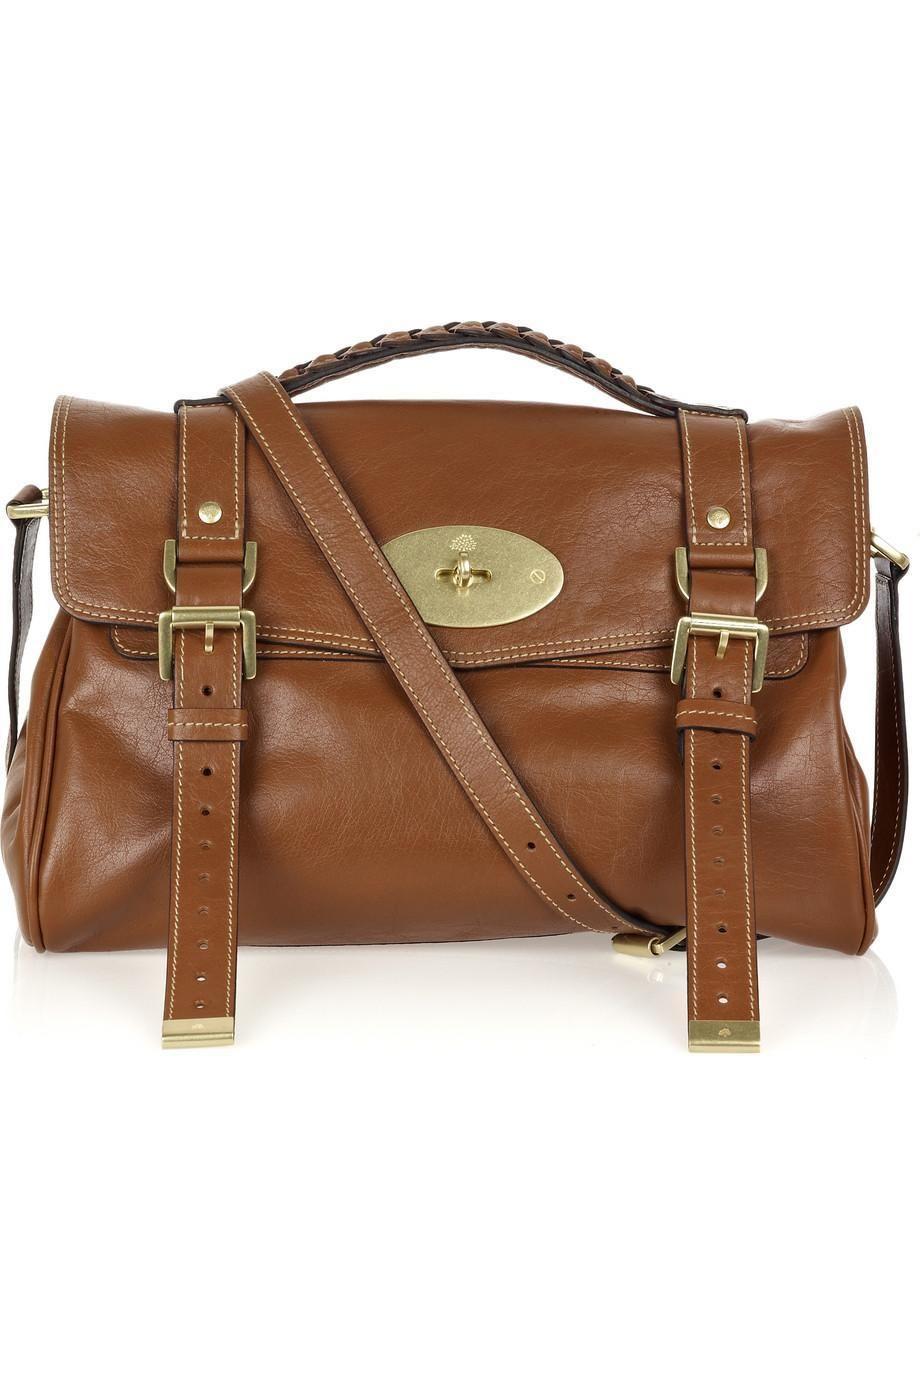 d7d04a437e02 Mulberry Alexa Leather Bag